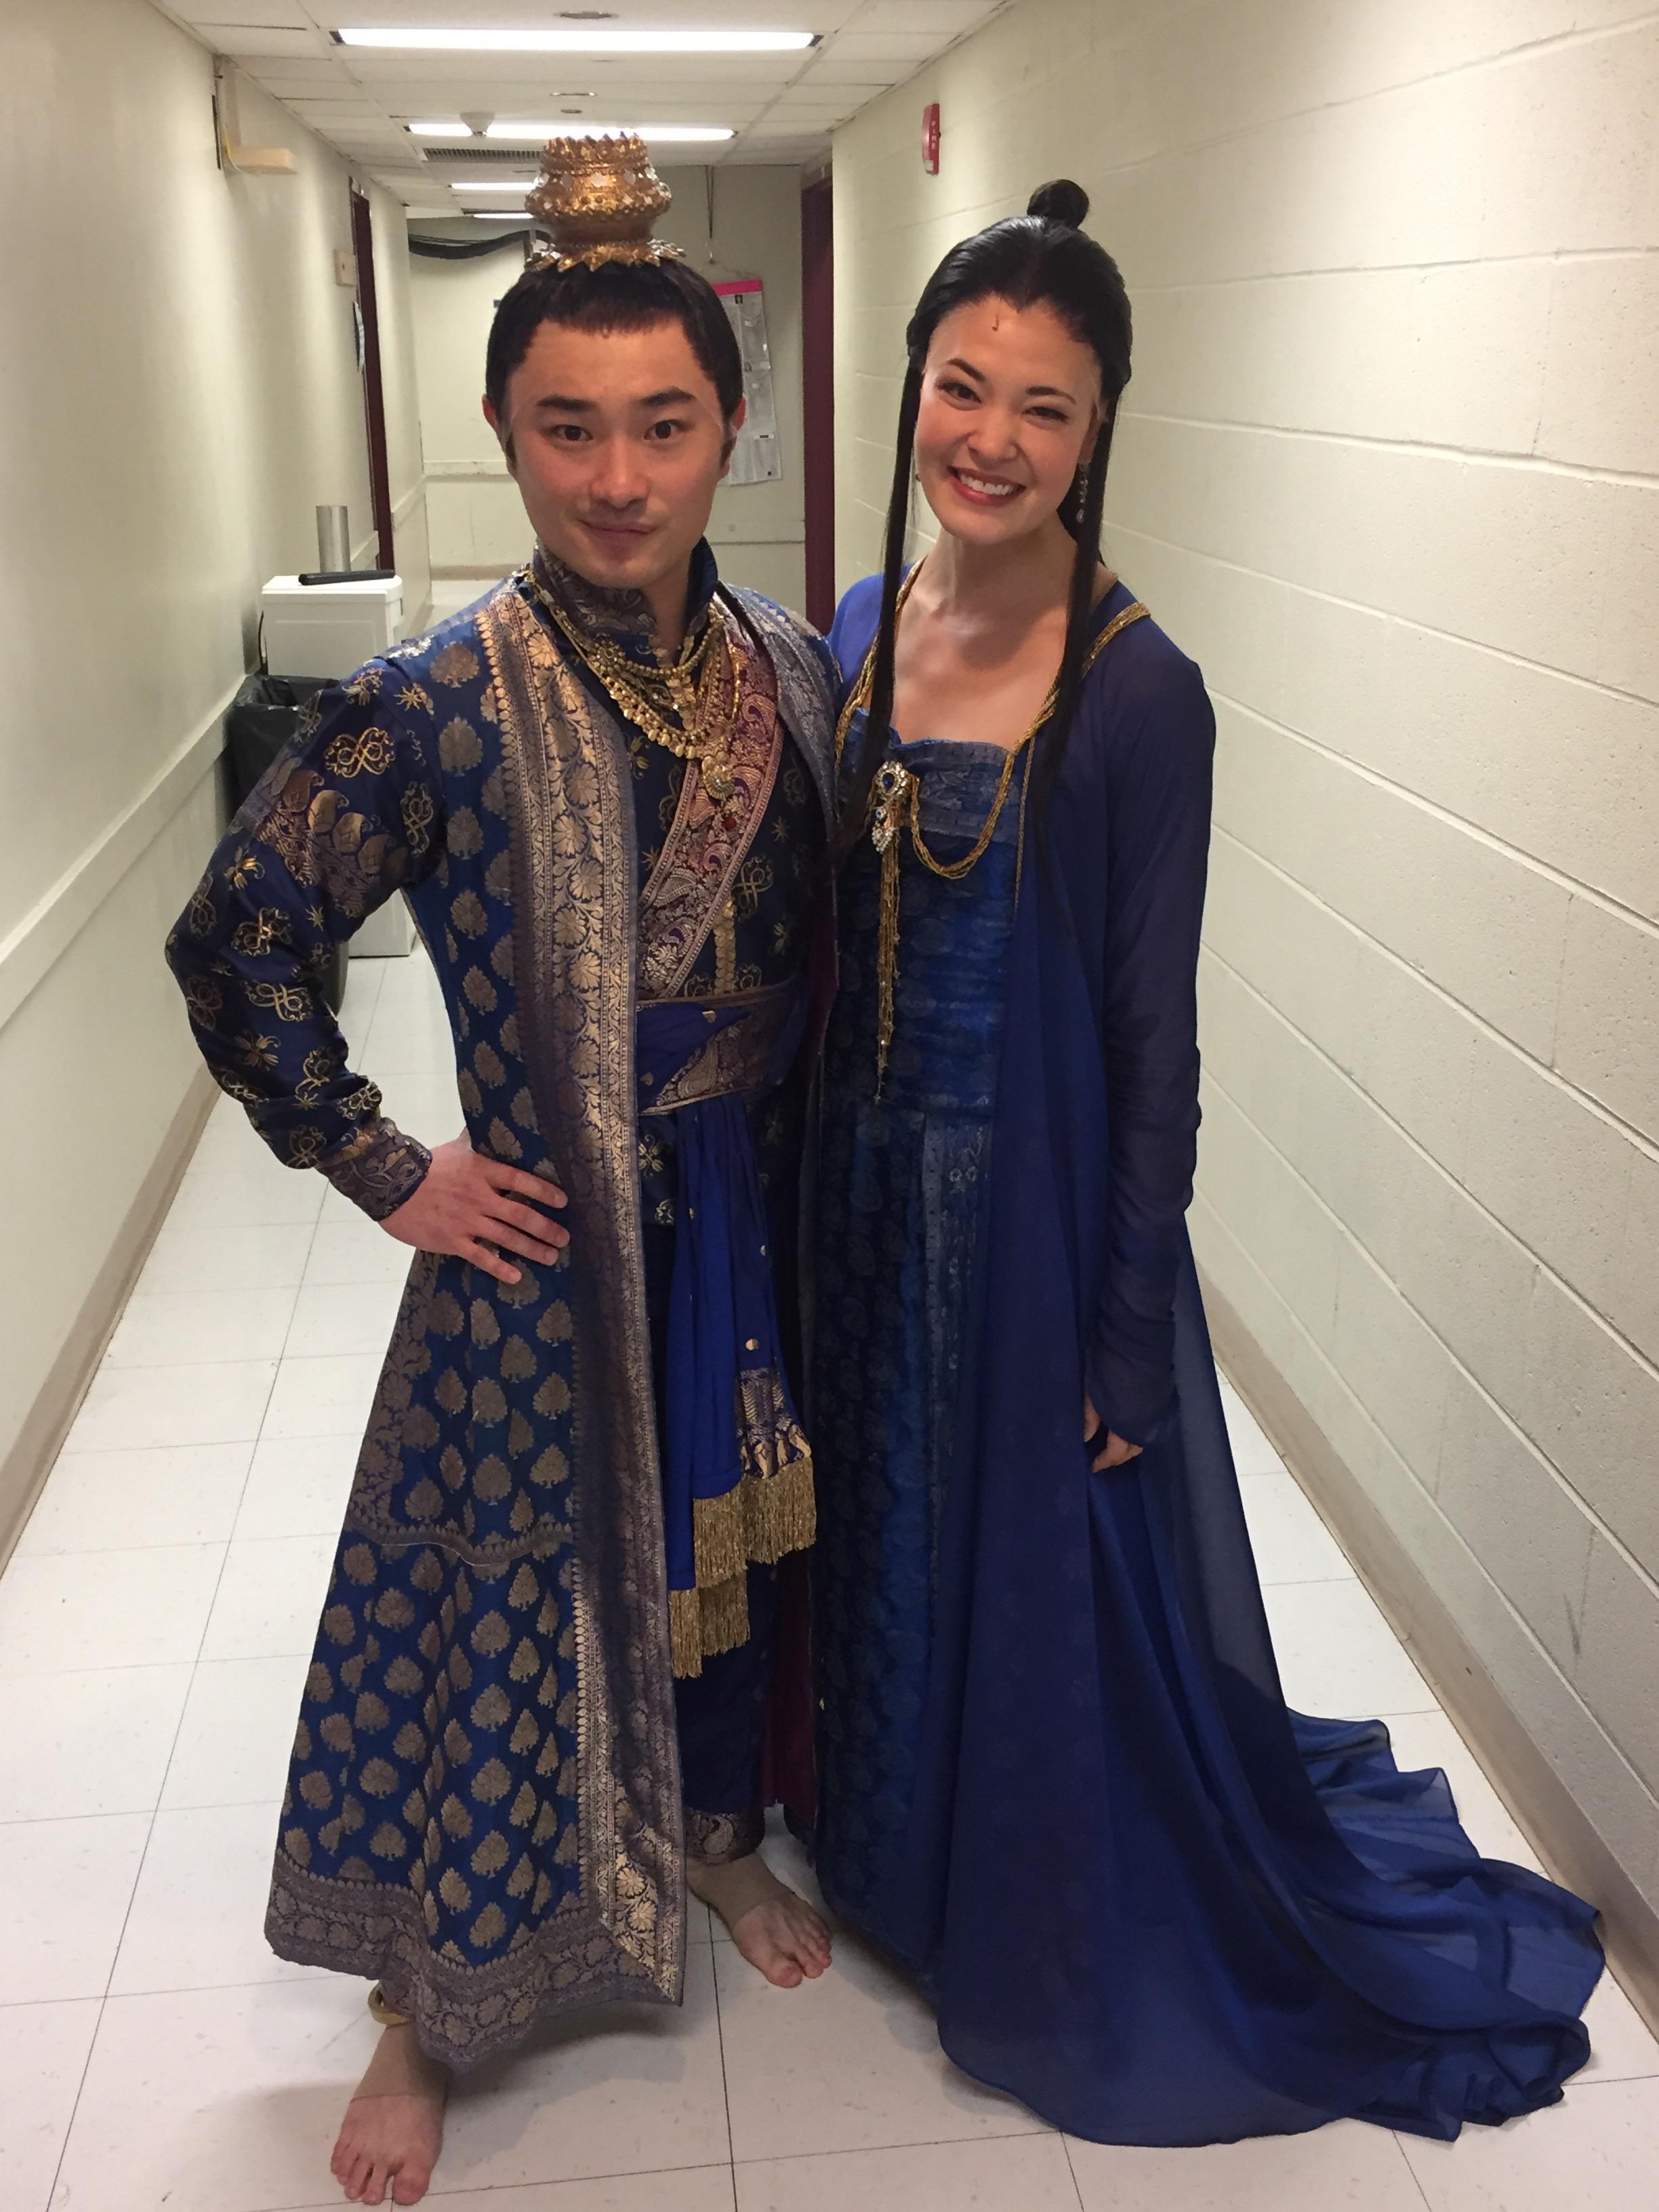 Marcus Shane as Prince Chulalongkorn with Manna Nichols as Tuptim